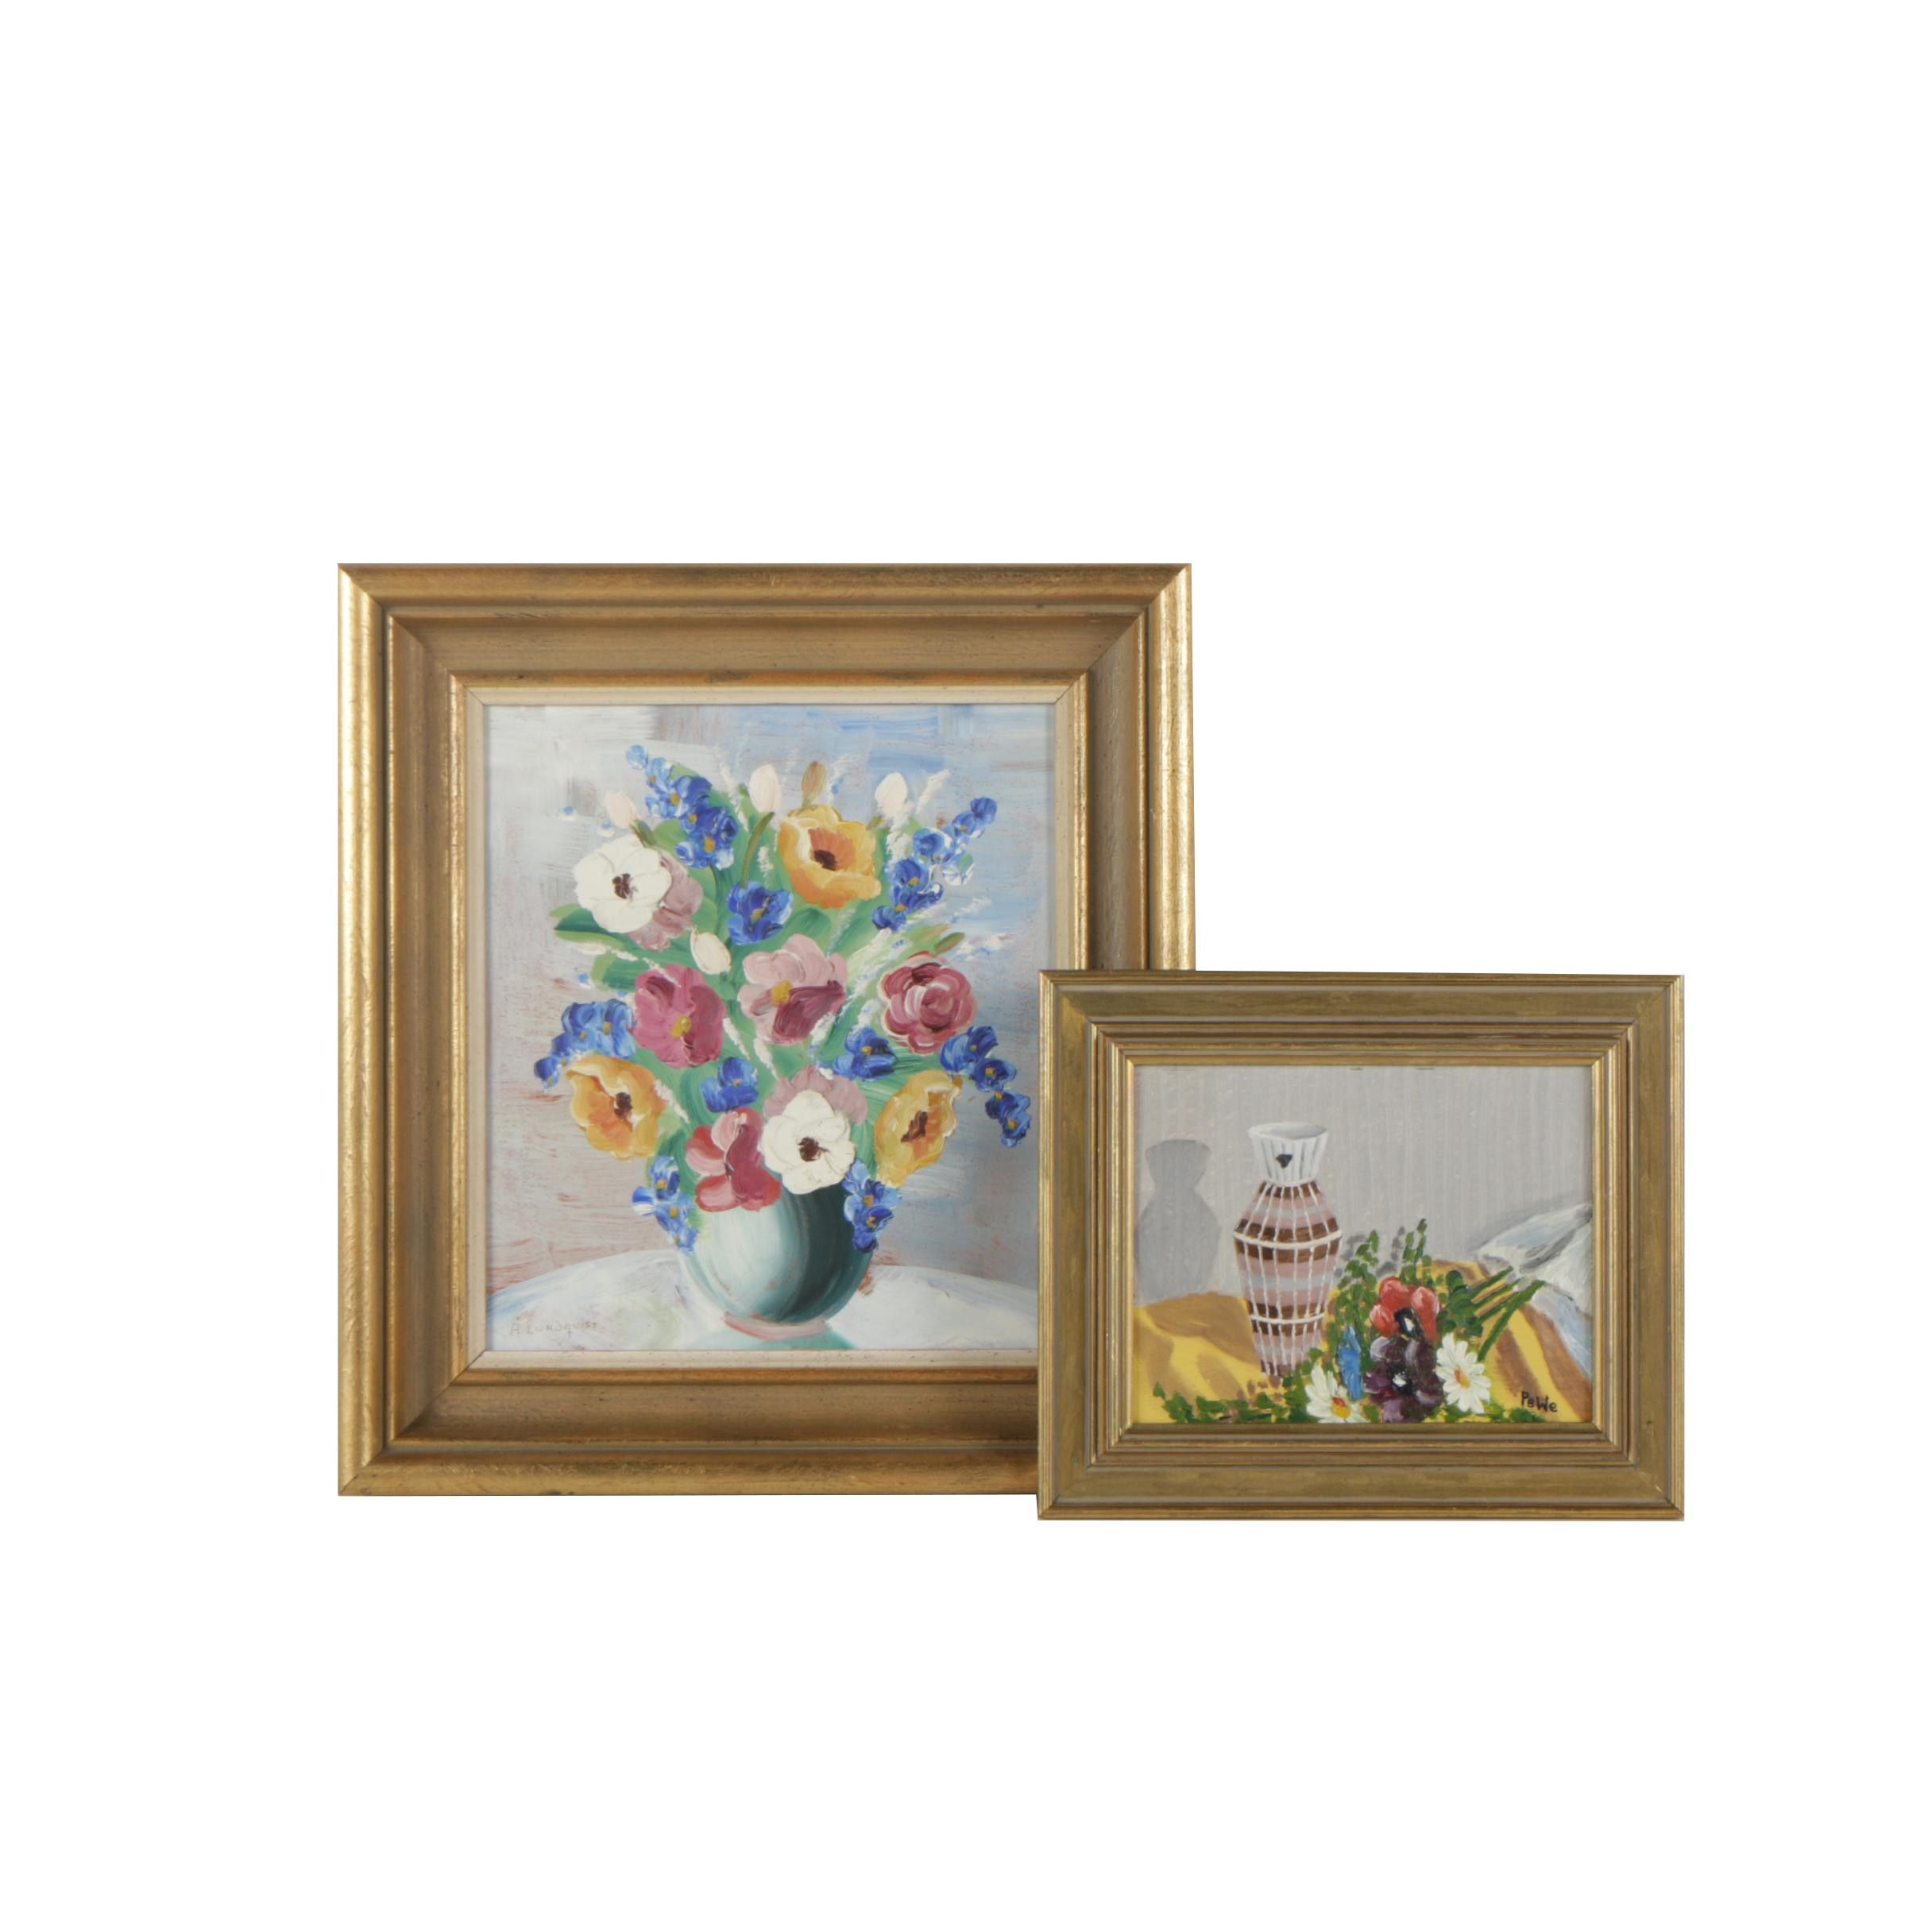 Floral Oil Still Life Paintings on Masonite